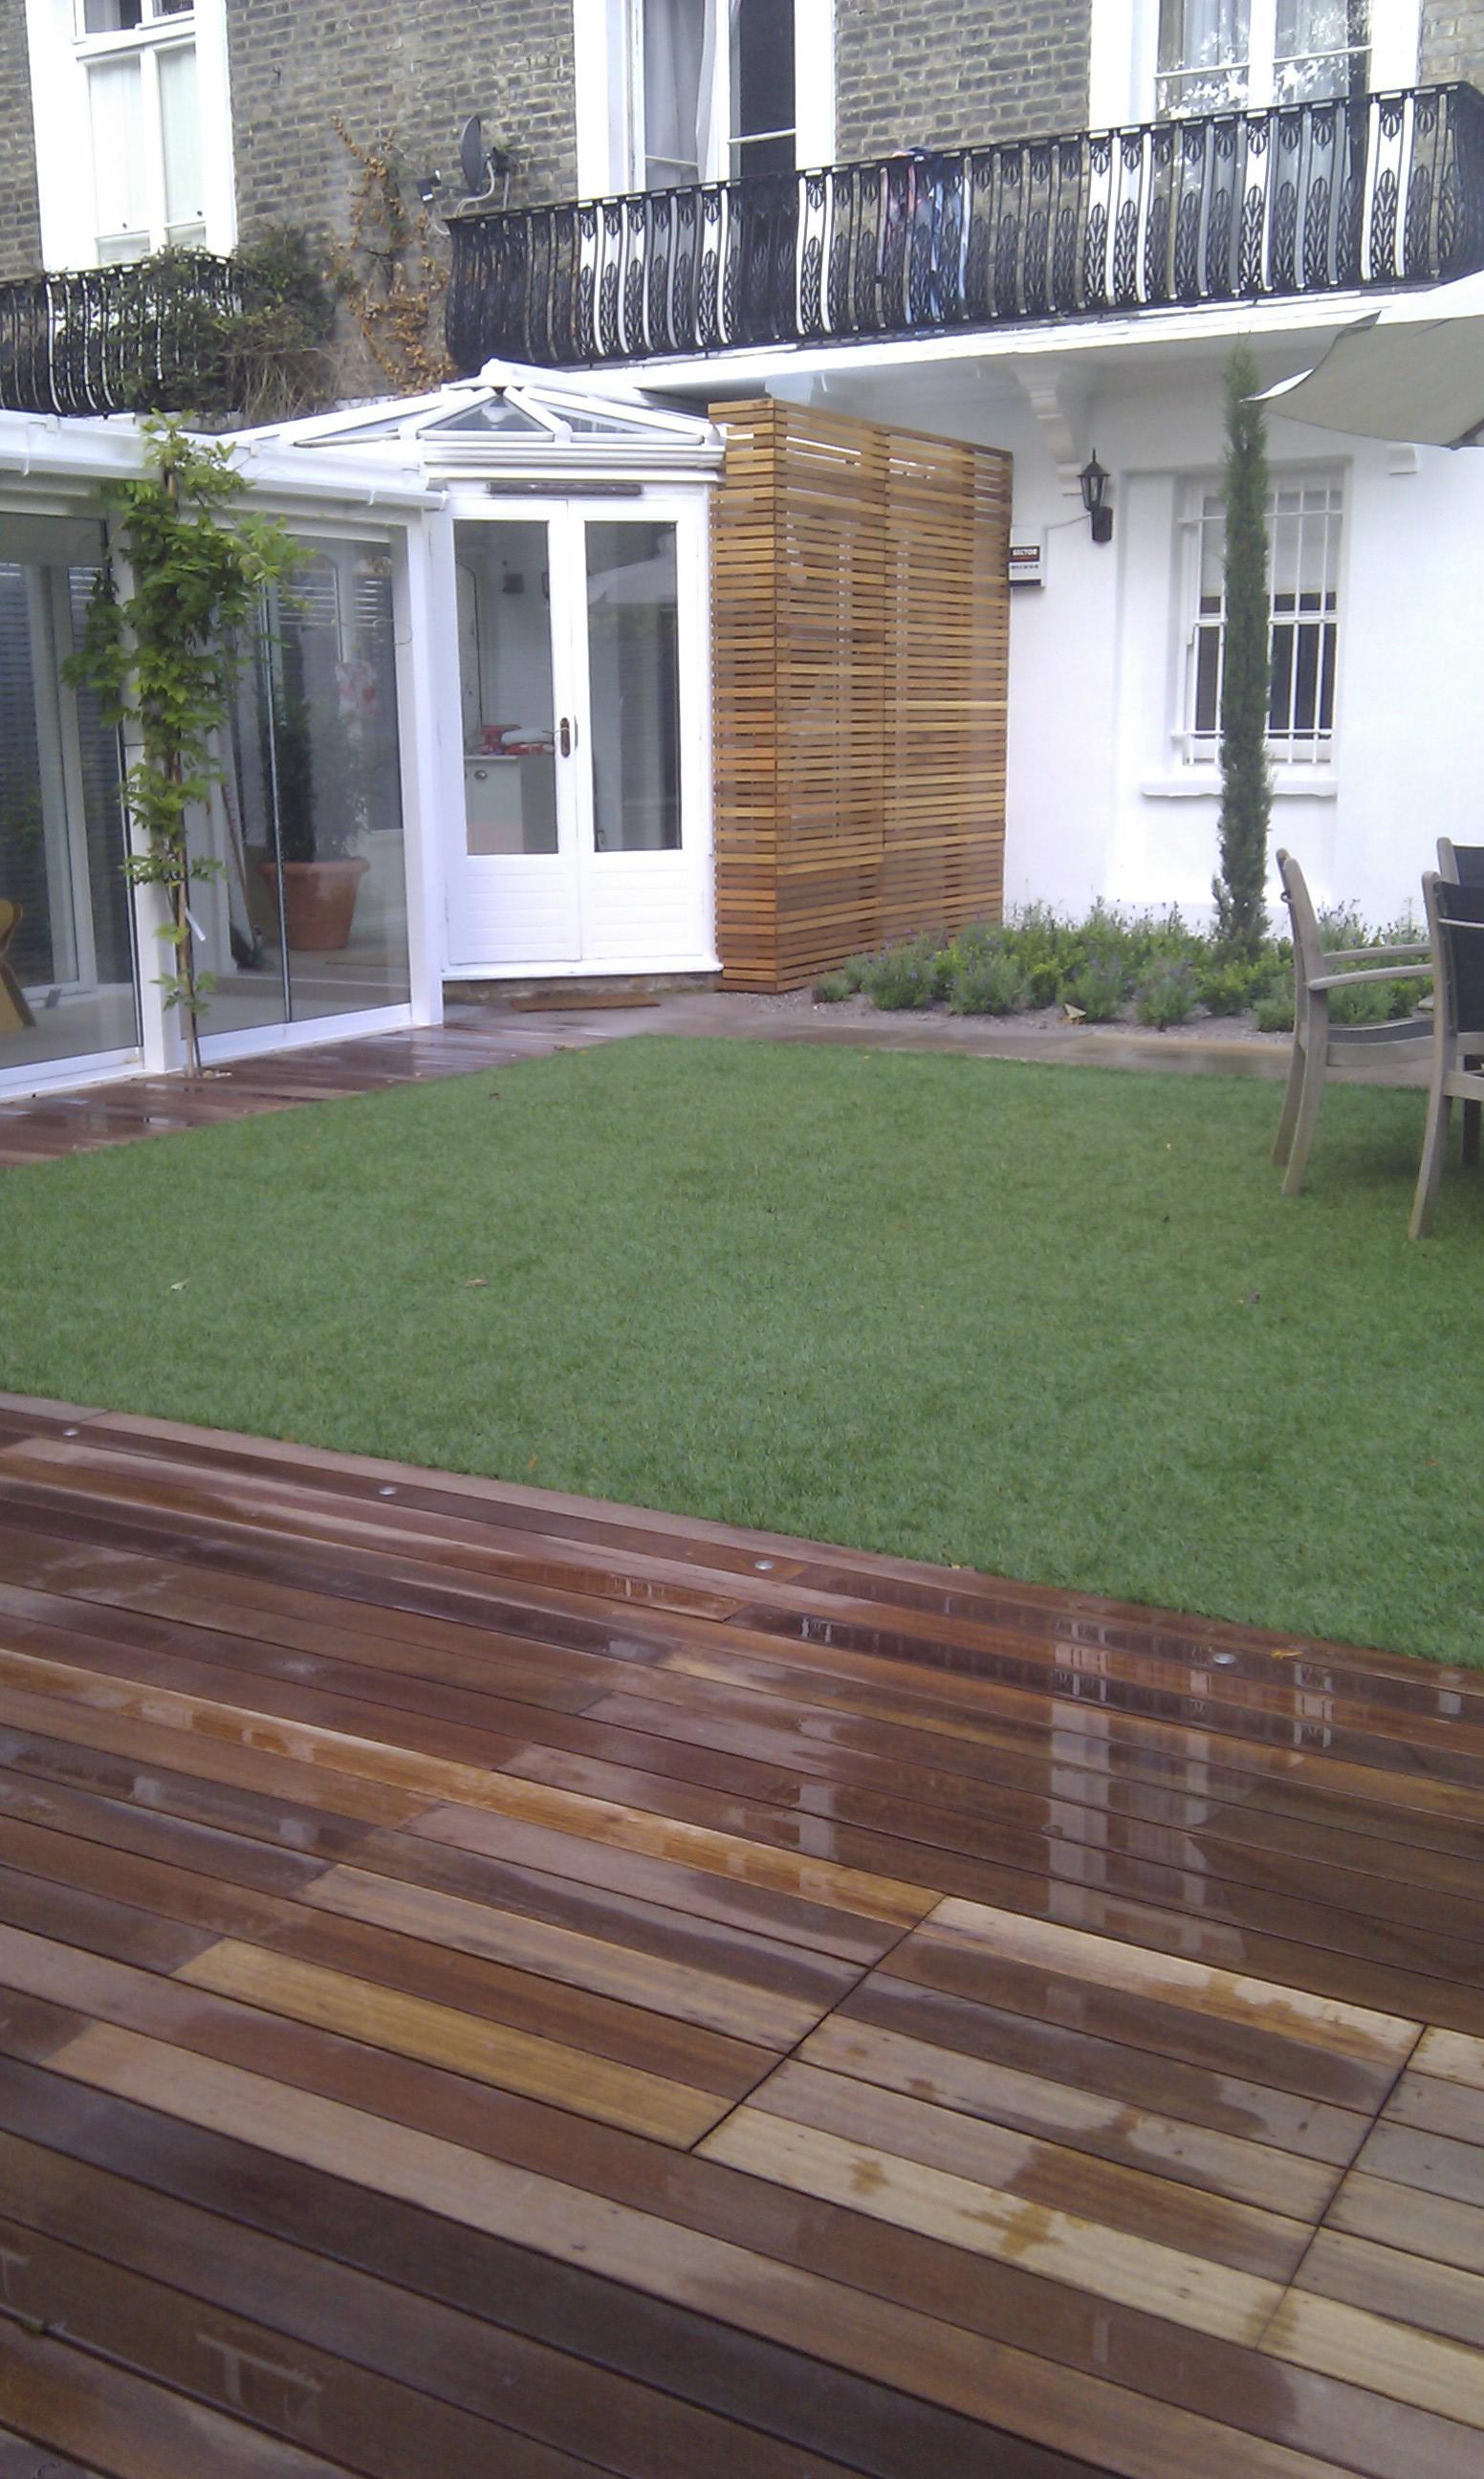 modern garden design london slatted grey privacy screen sandstone paving easy grass balau hardwood decking (32)